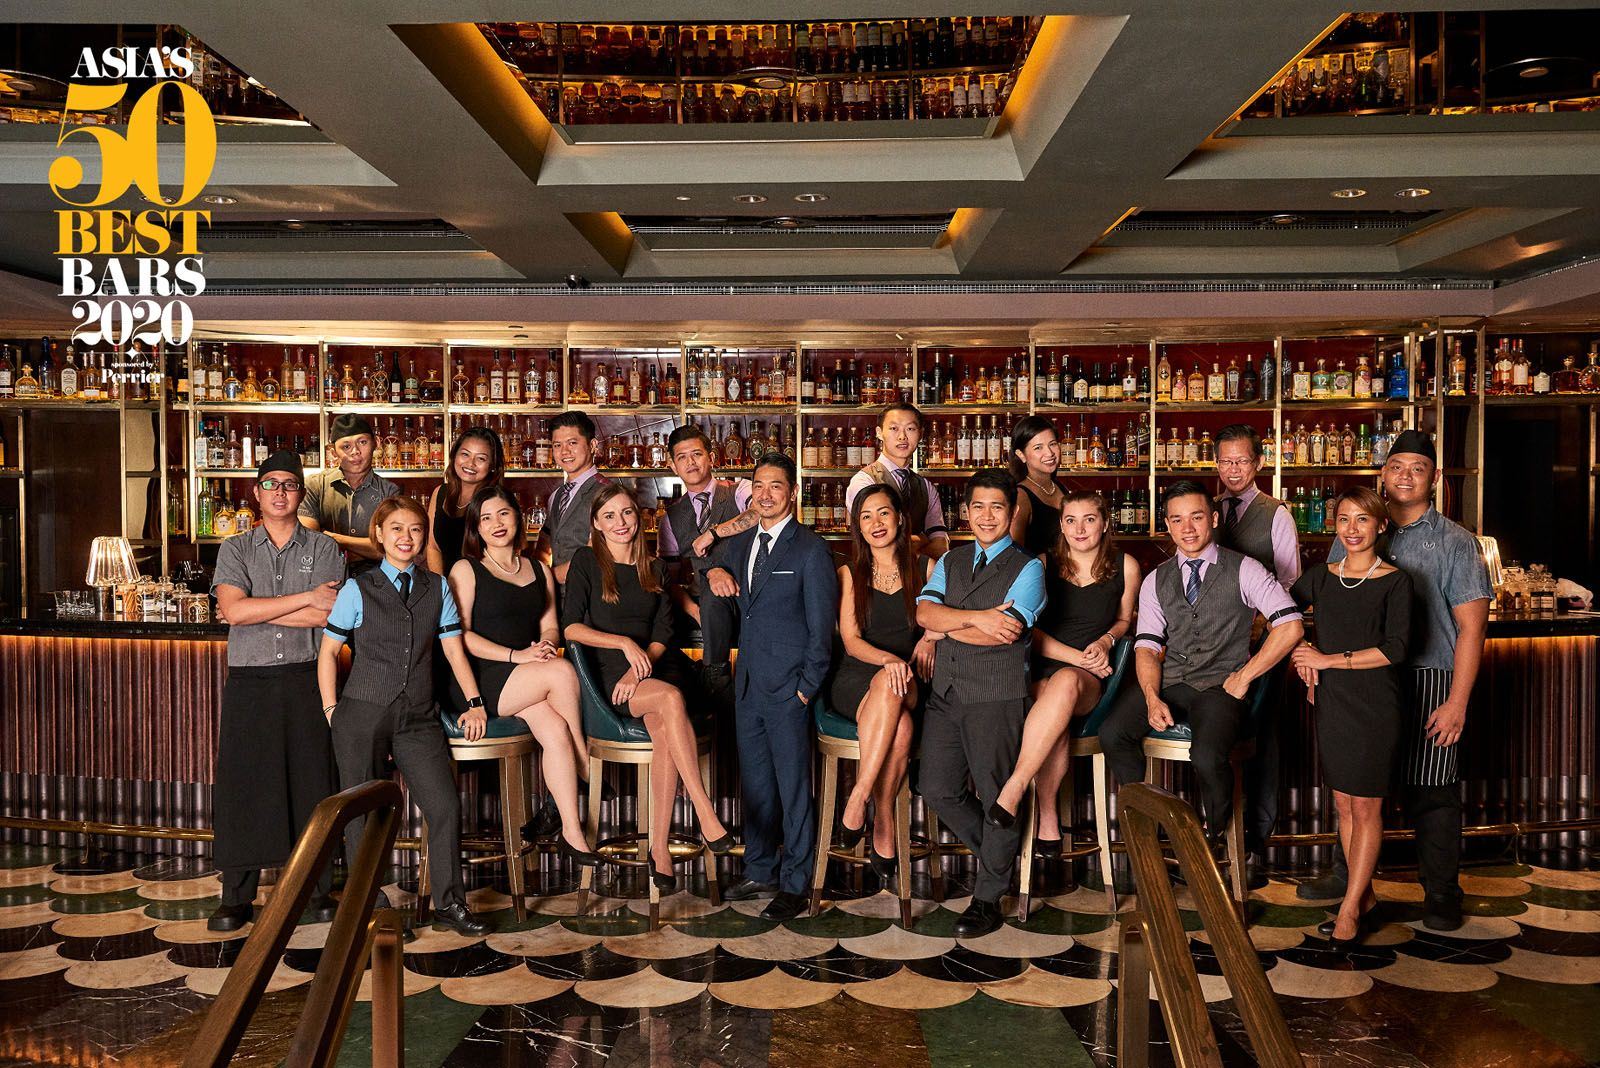 Manhattan Bar Wins Prestigious New Award at Asia's 50 Best Bars 2020